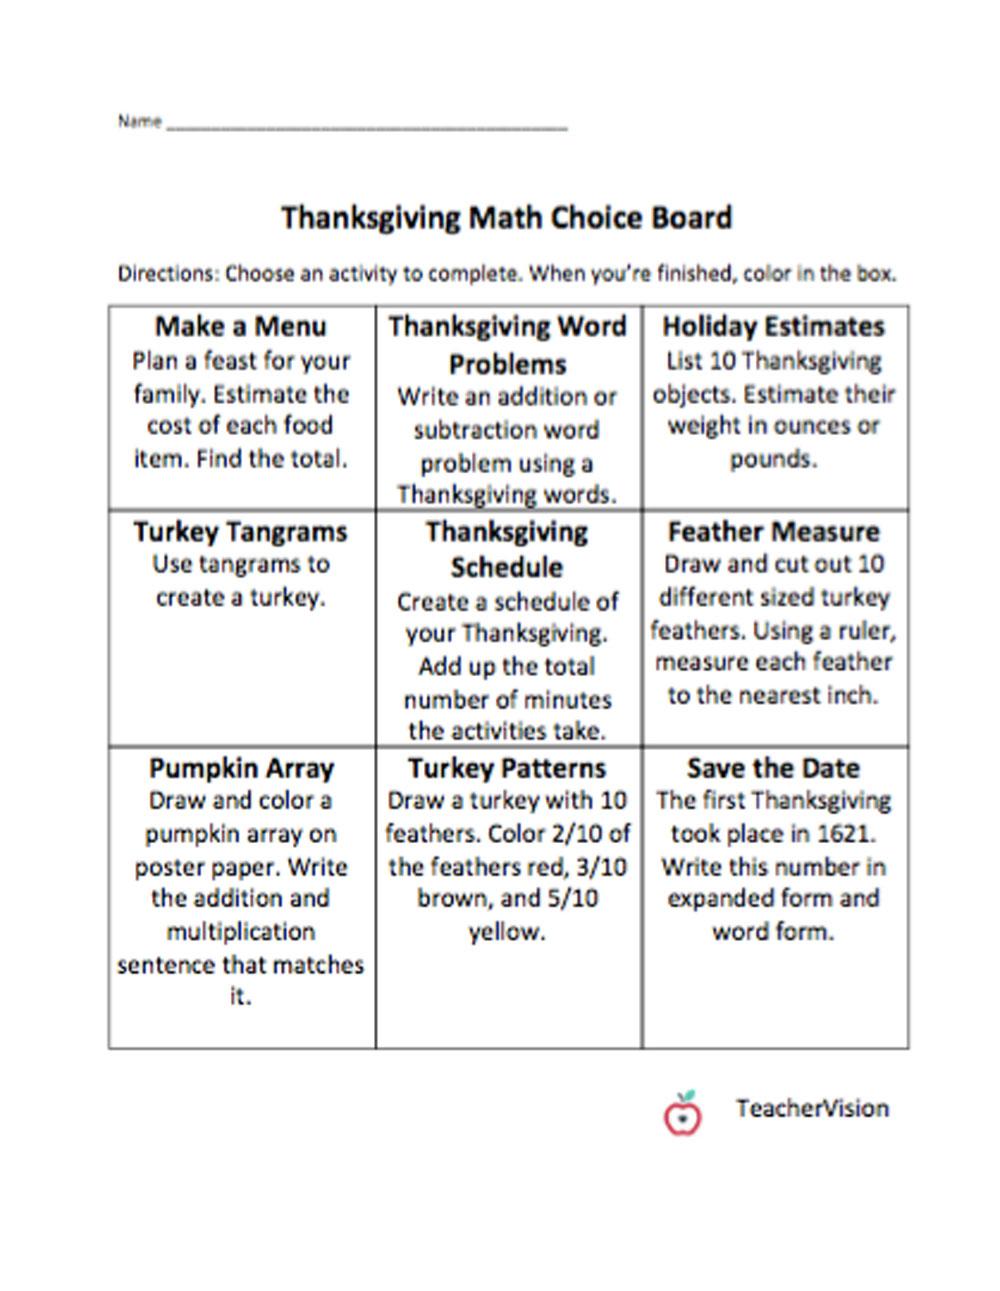 hight resolution of Math Thanksgiving Choice Board - TeacherVision